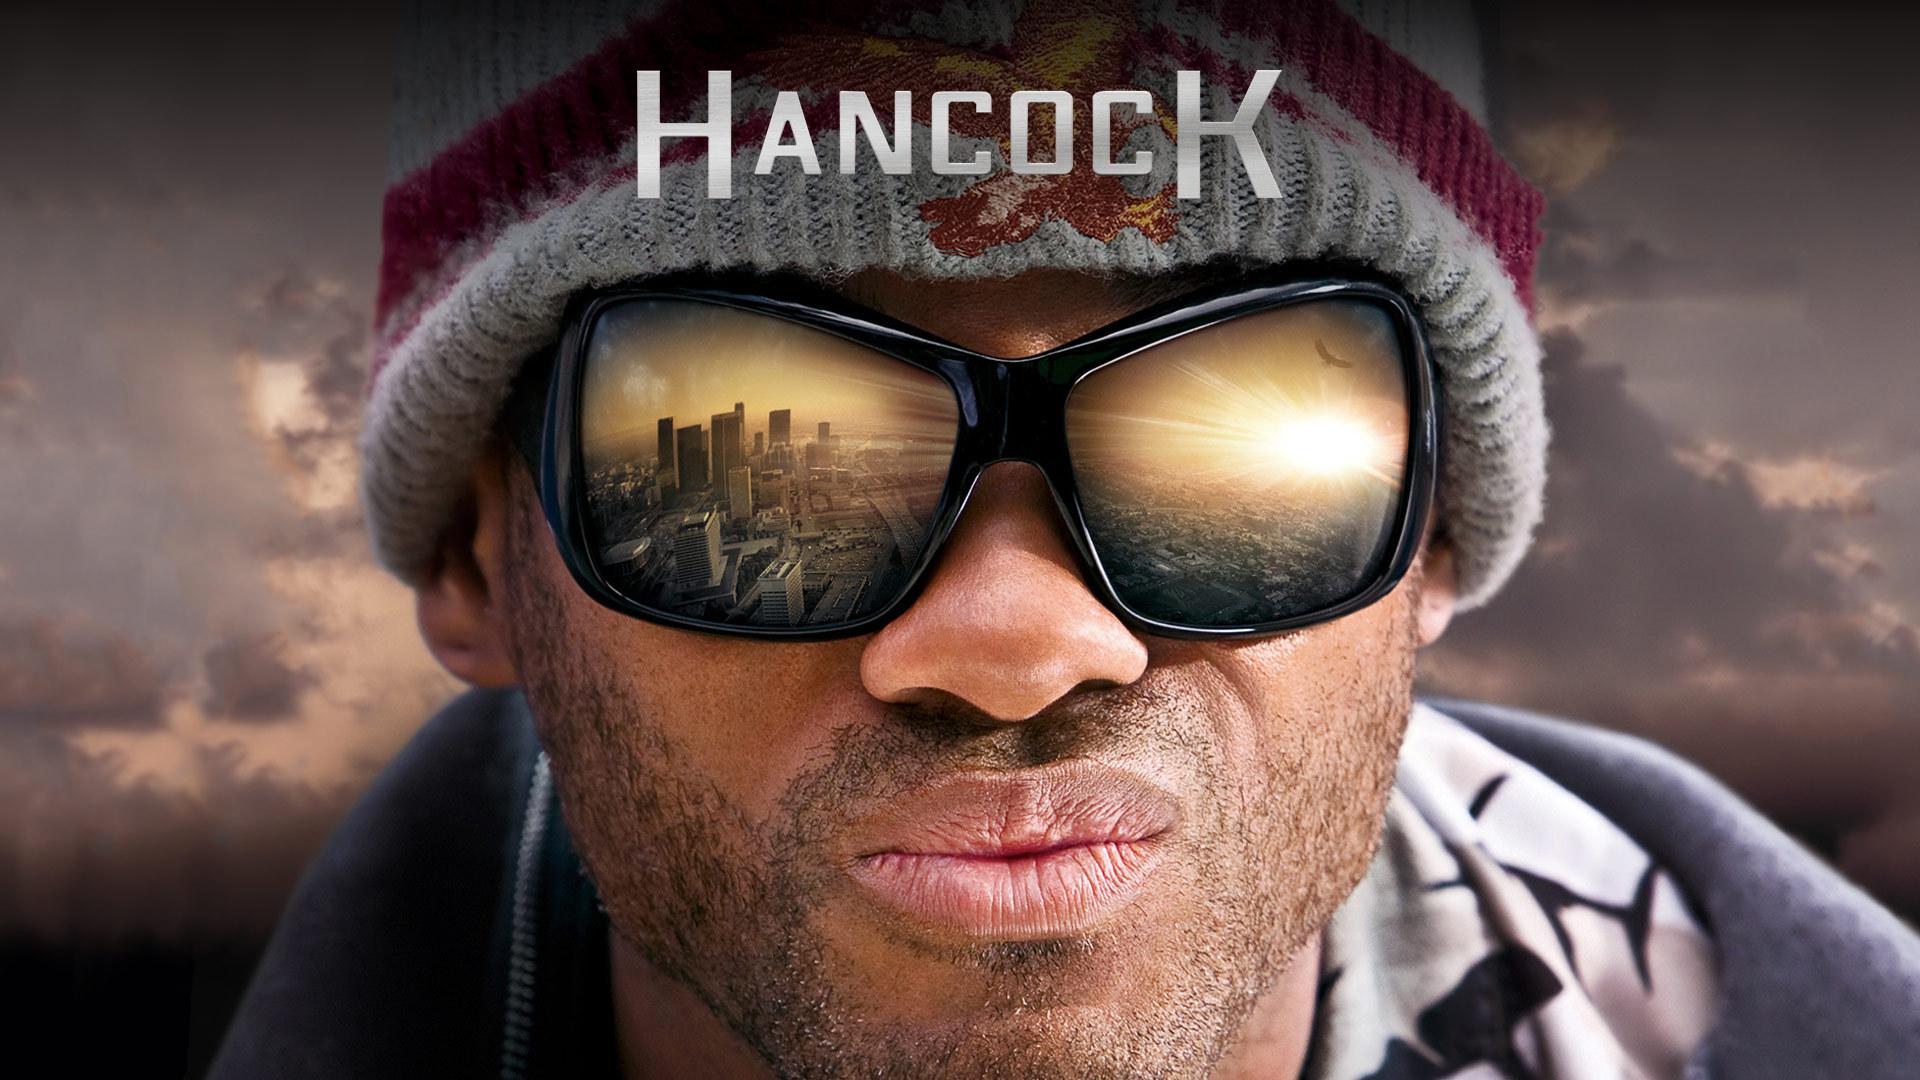 Hancock (4K UHD)